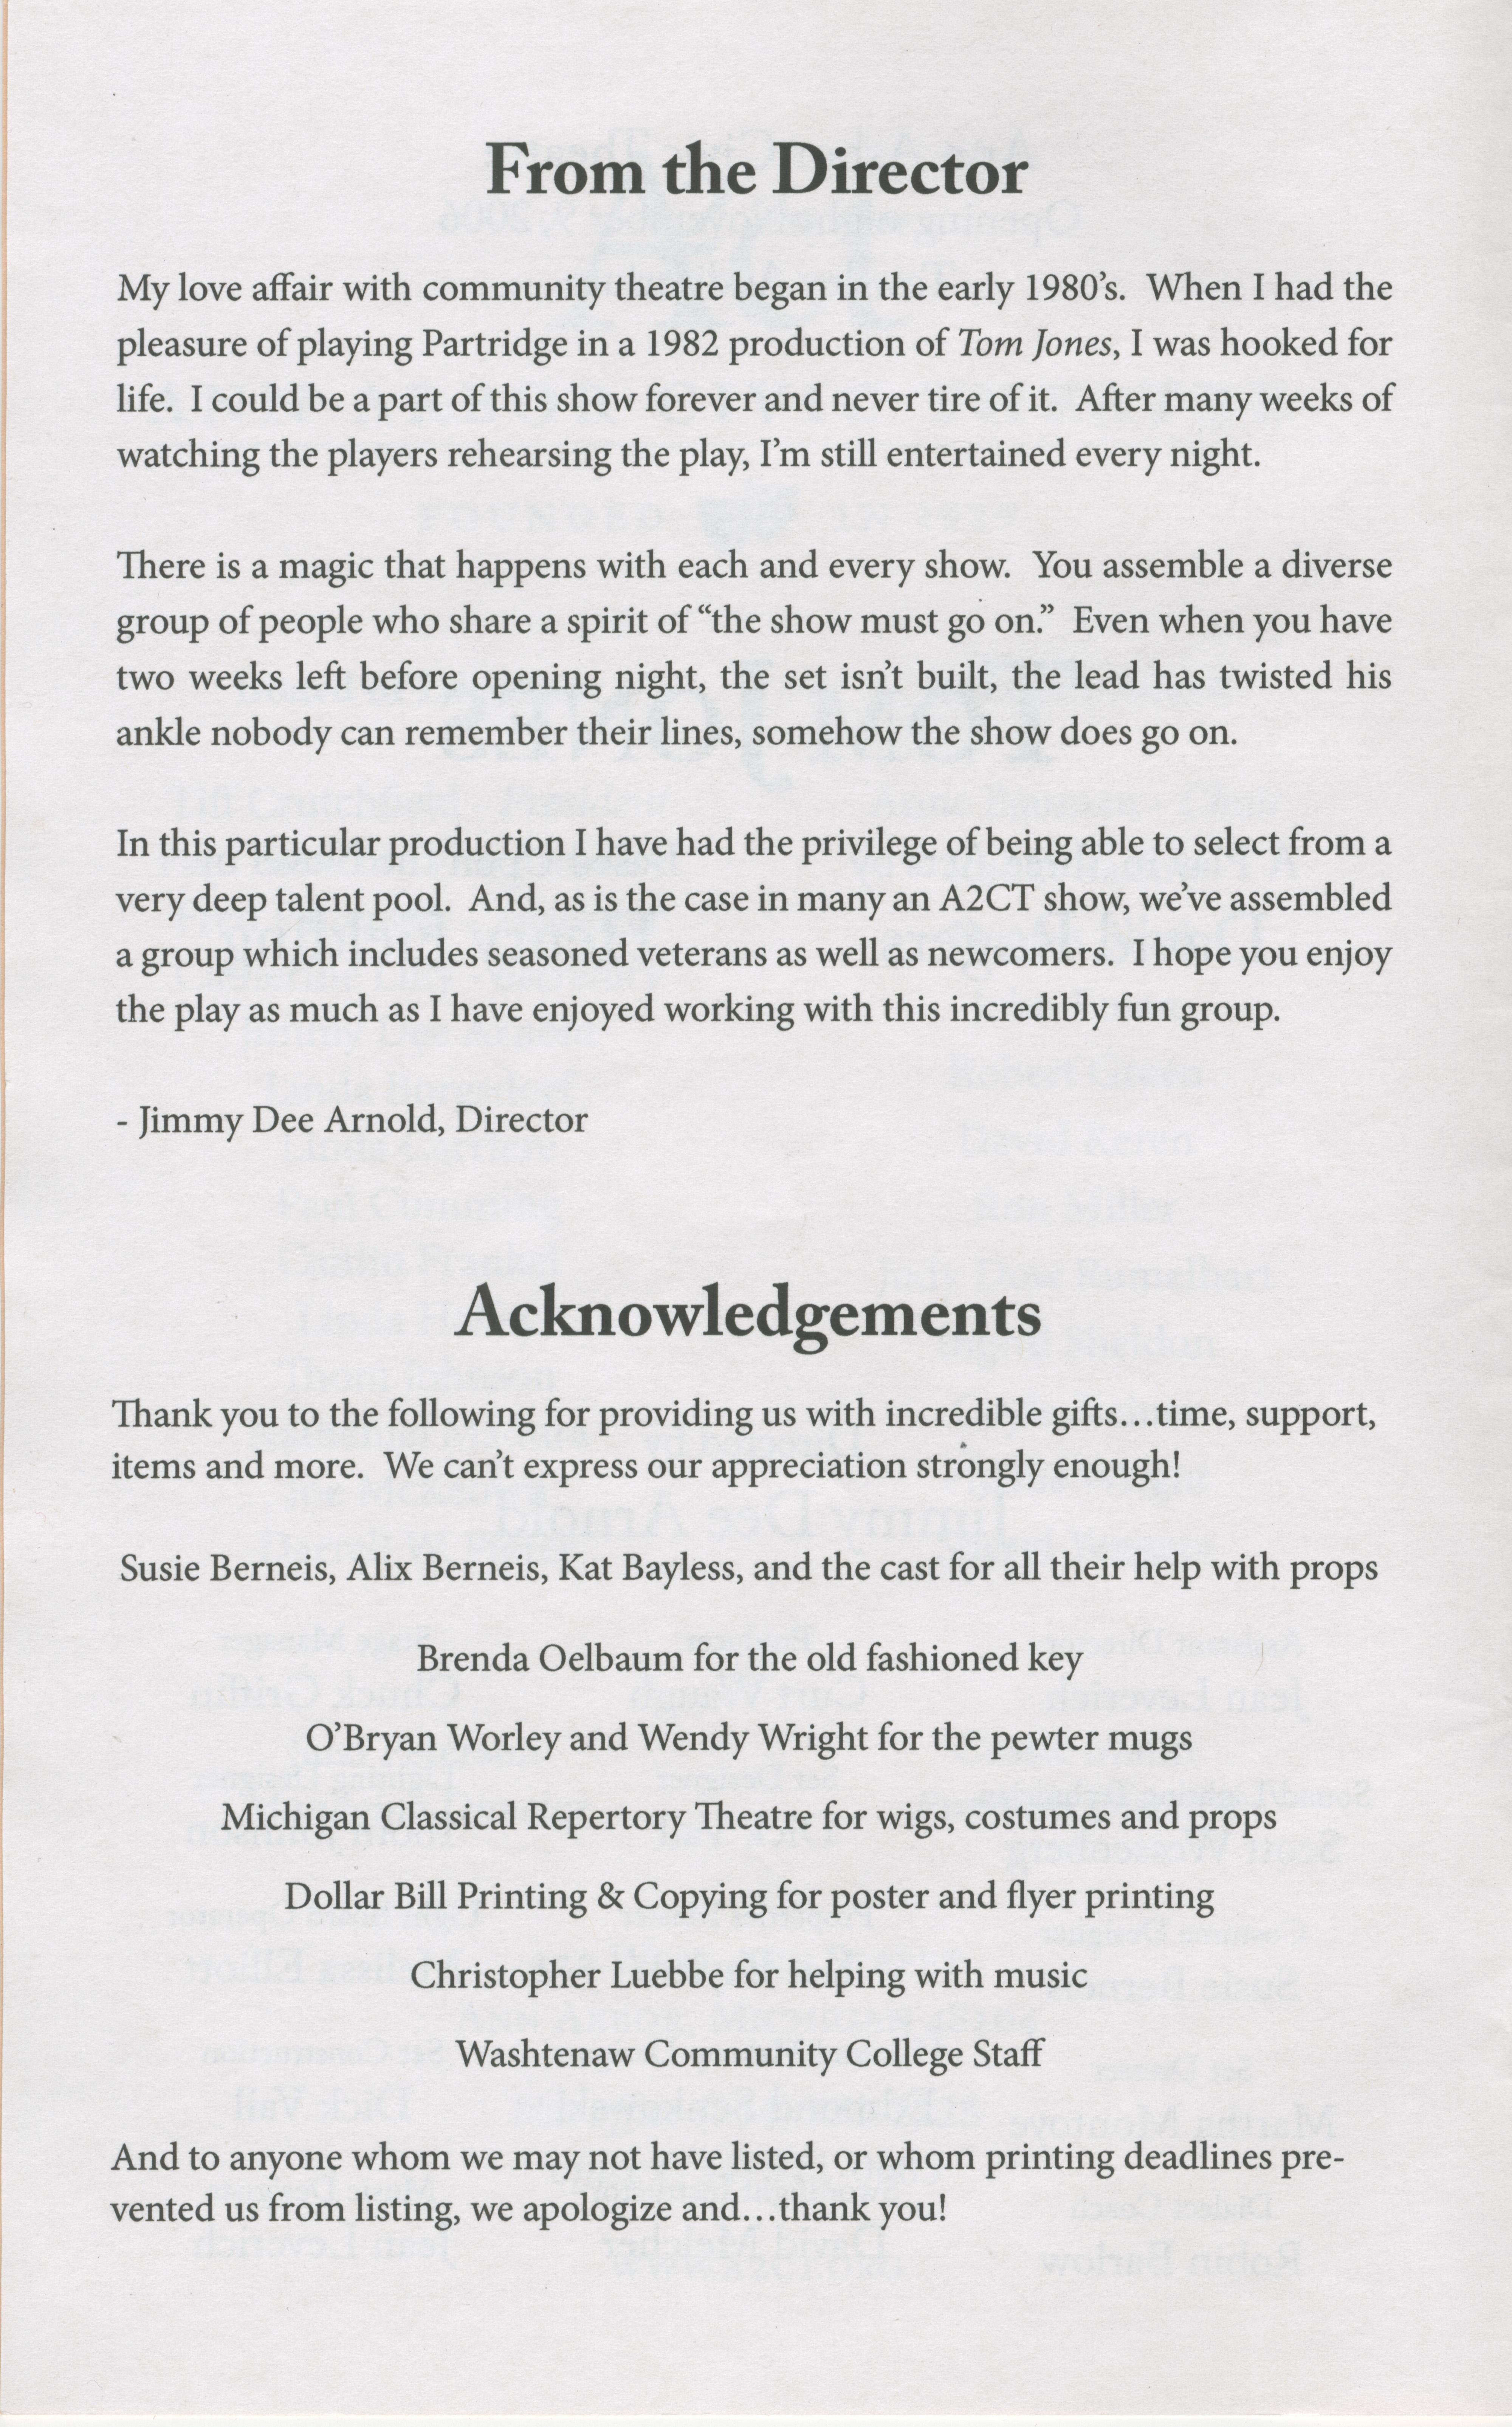 Ann Arbor Civic Theatre Program: Tom Jones, November 09, 2006